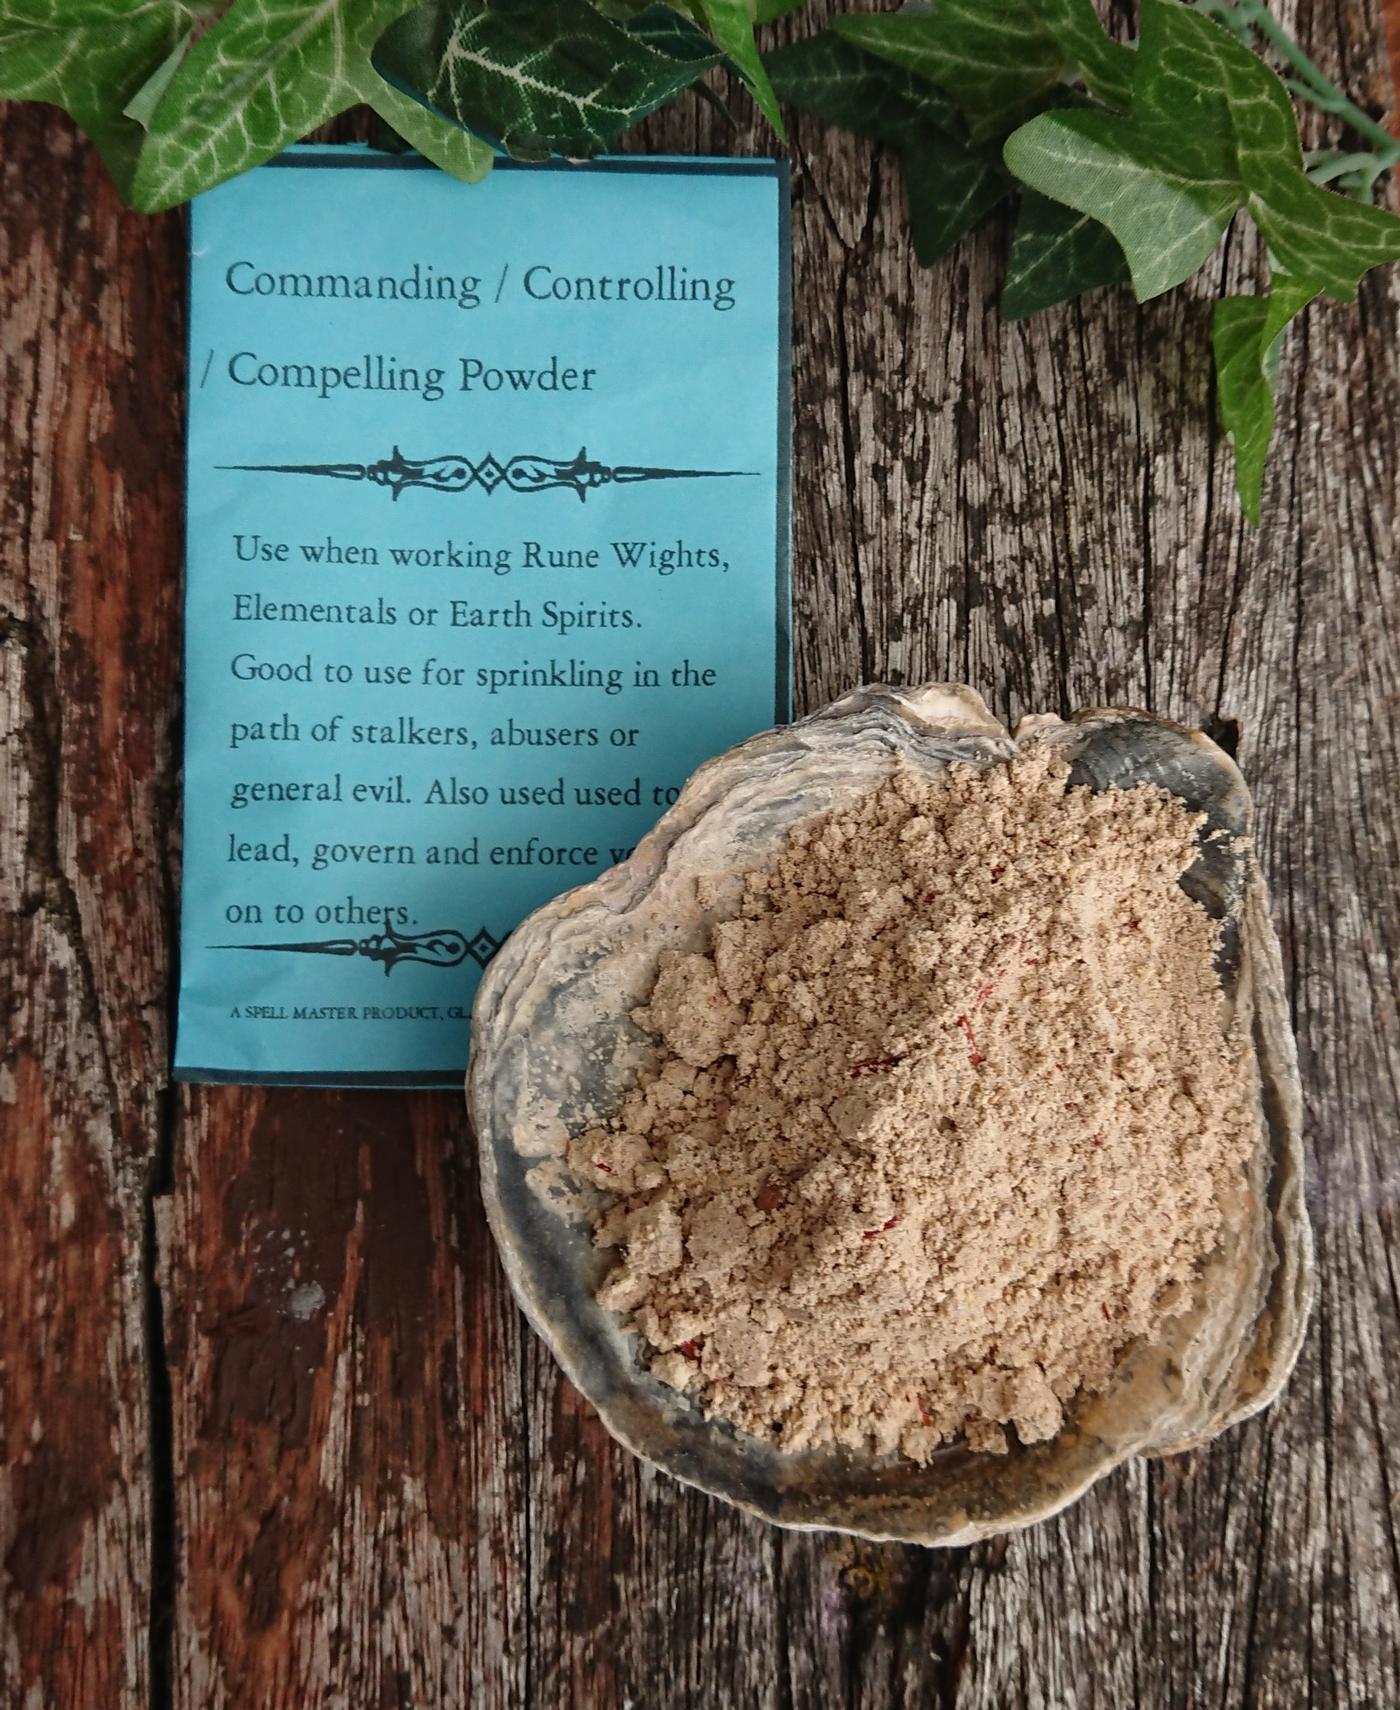 Commanding - Controlling powder